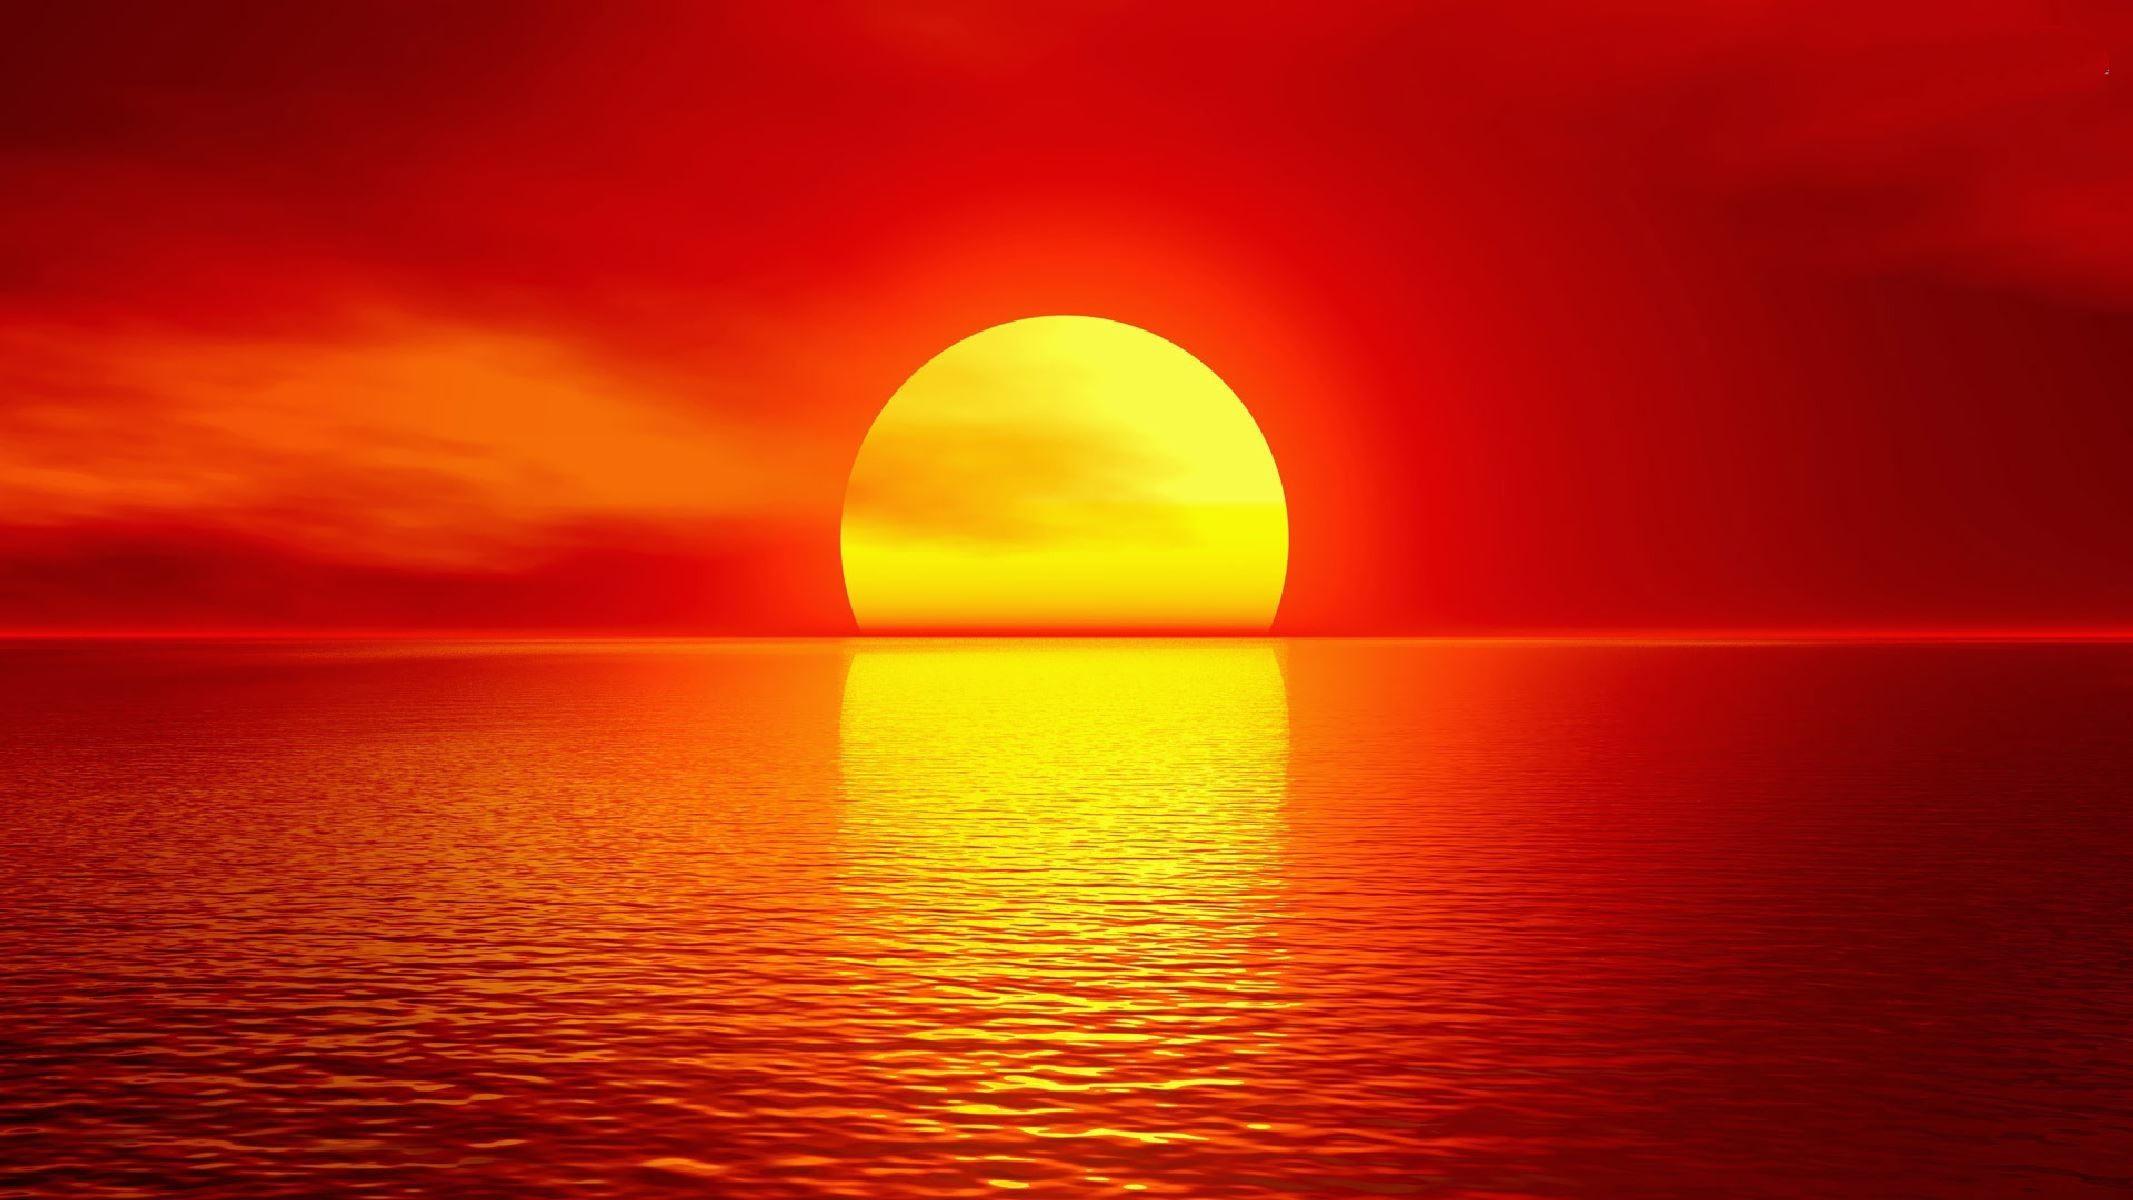 arizona sunset wallpaper (52+ images)